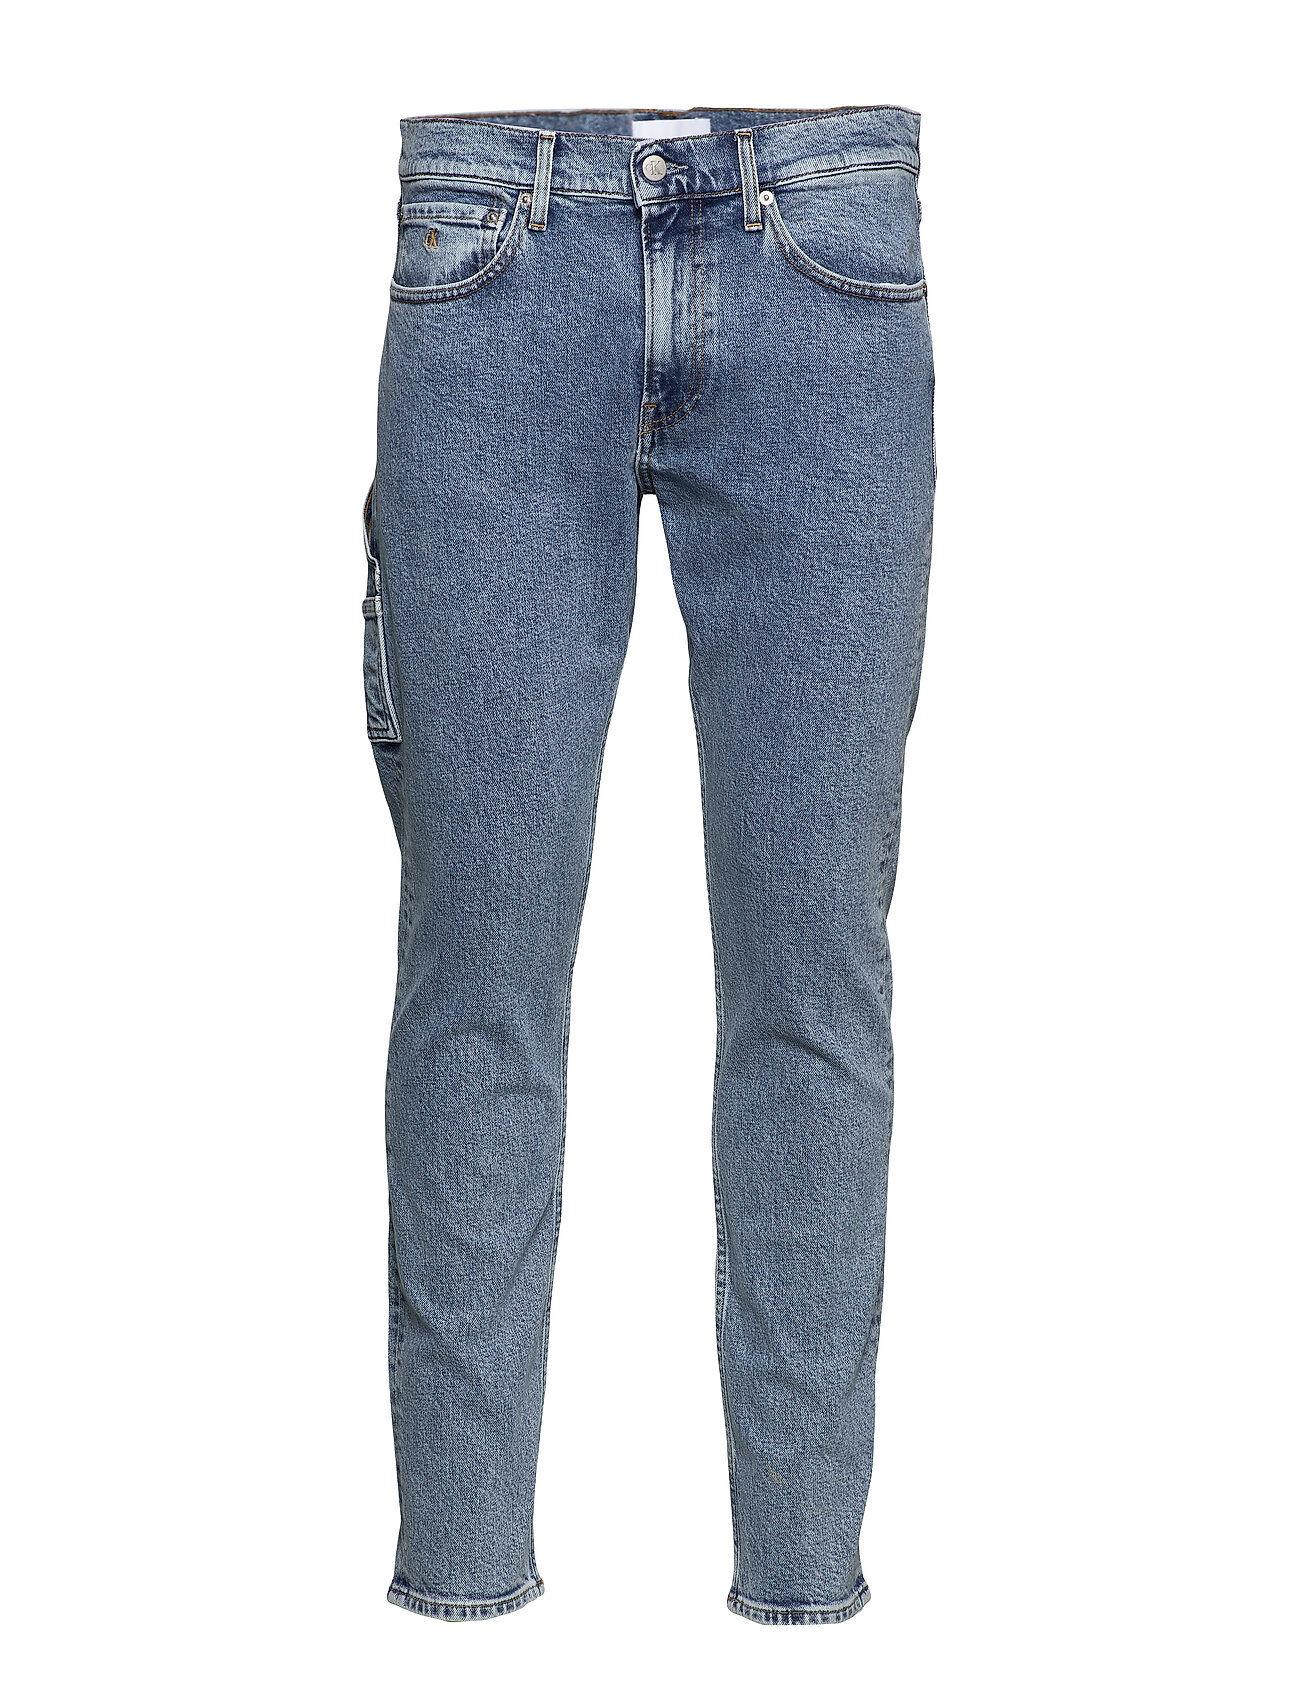 Image of Calvin Utility Slim Taper Tiukat Farkut Sininen Calvin Klein Jeans